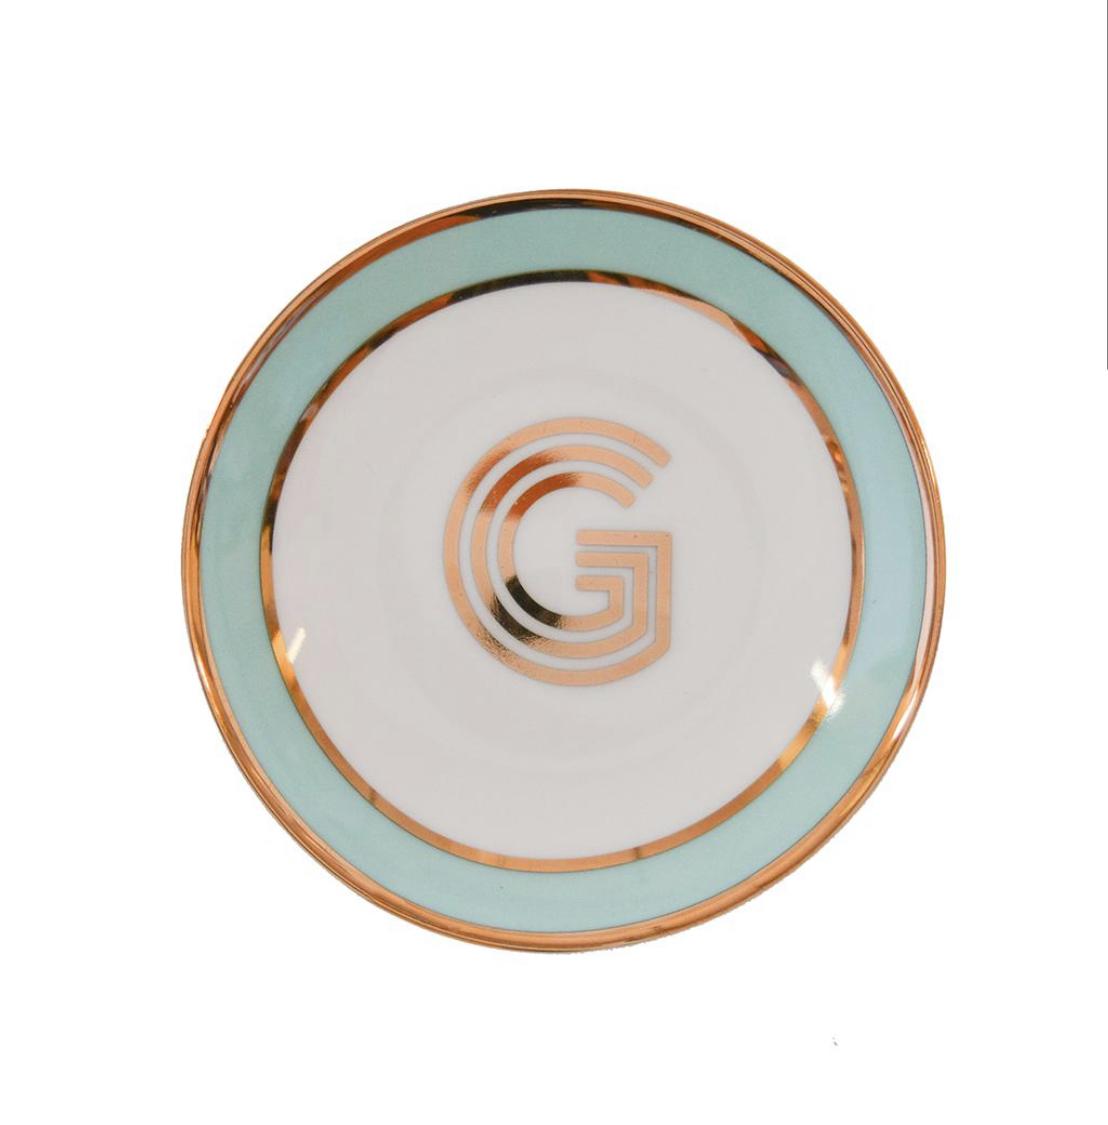 Bombay Duck Alphabet Trinket Dish - G